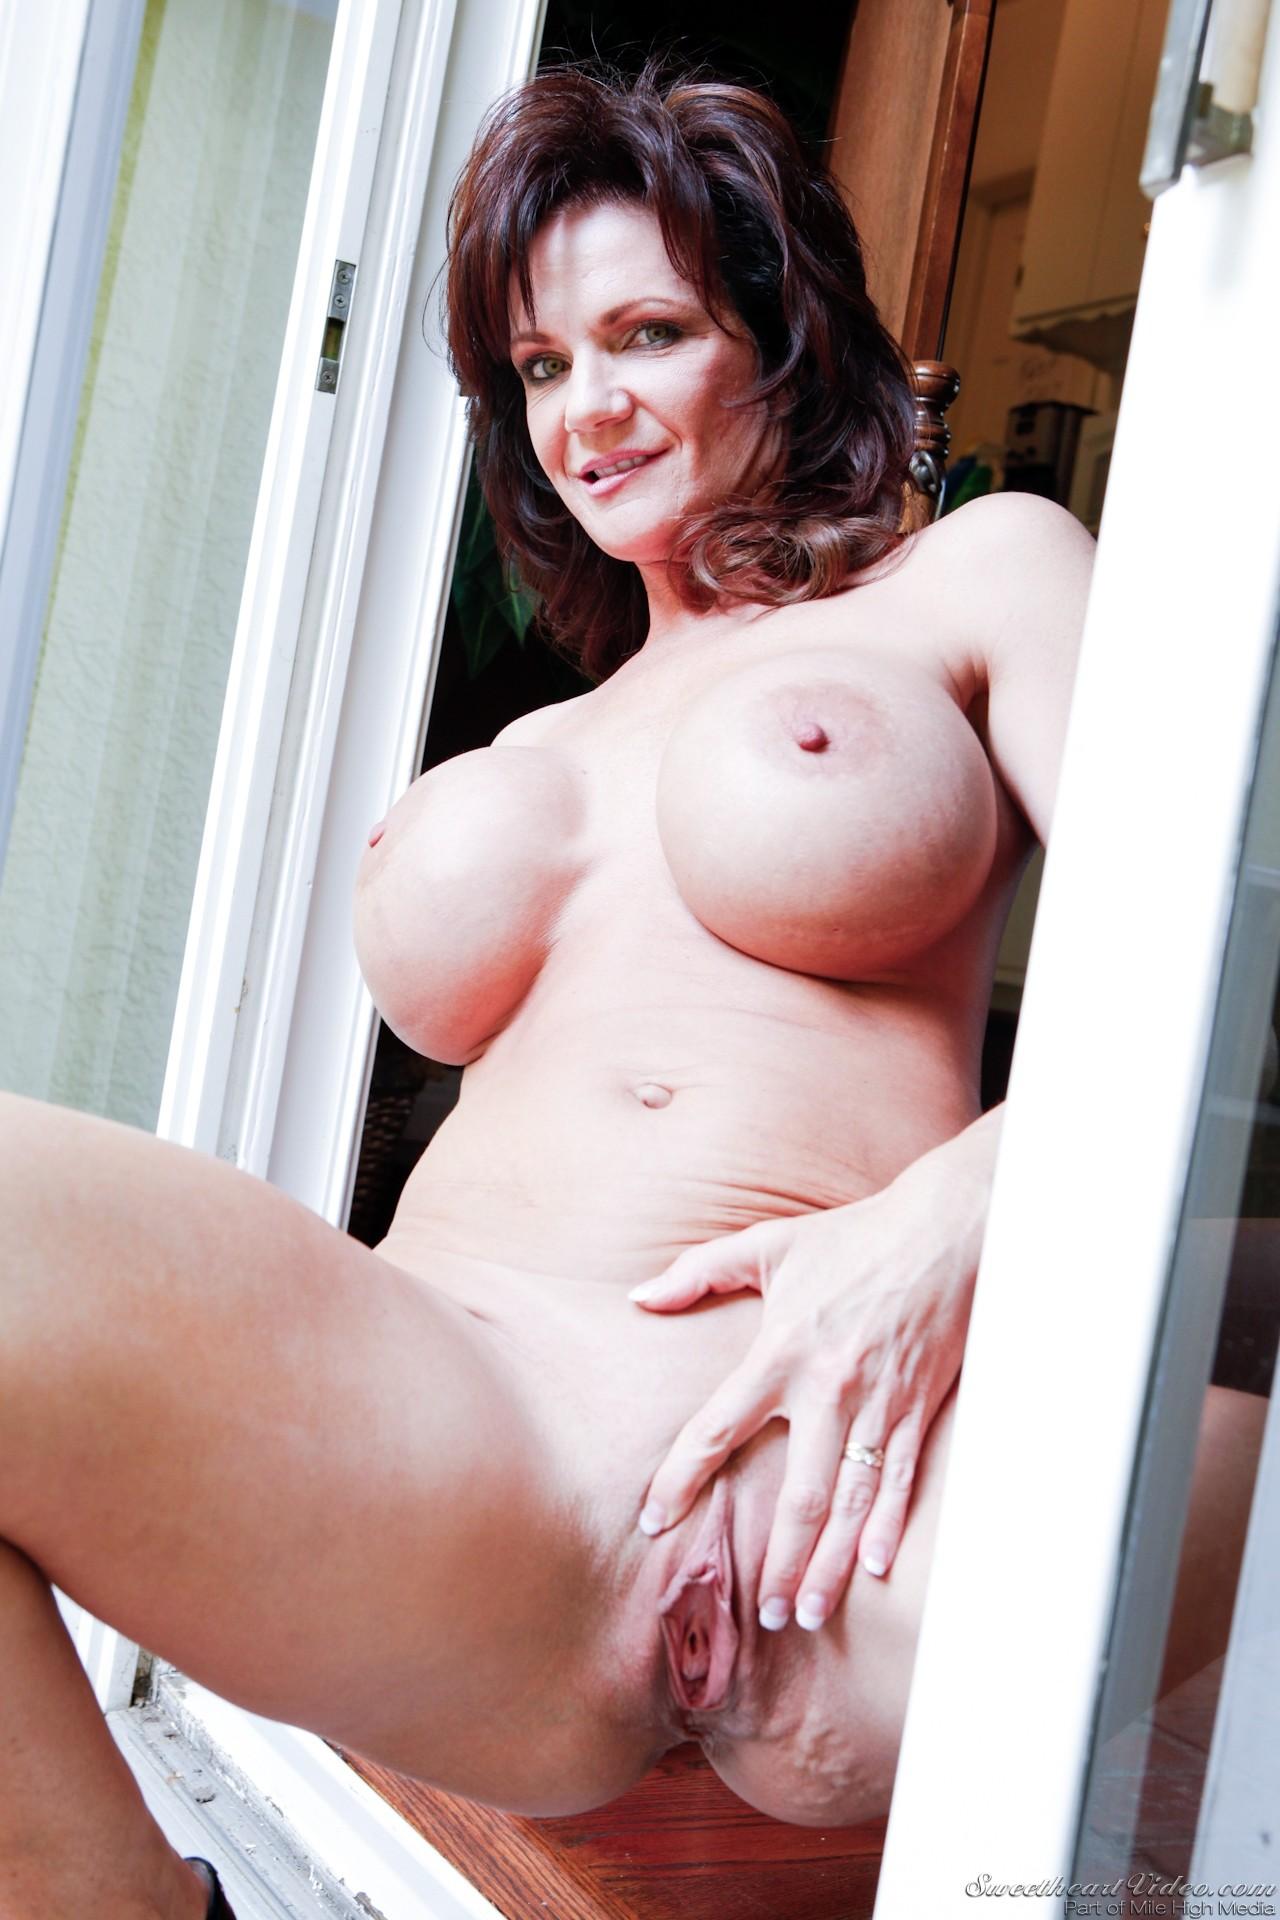 Nicole Ray, Deauxma - Lesbian Mentors Vol 02 77452